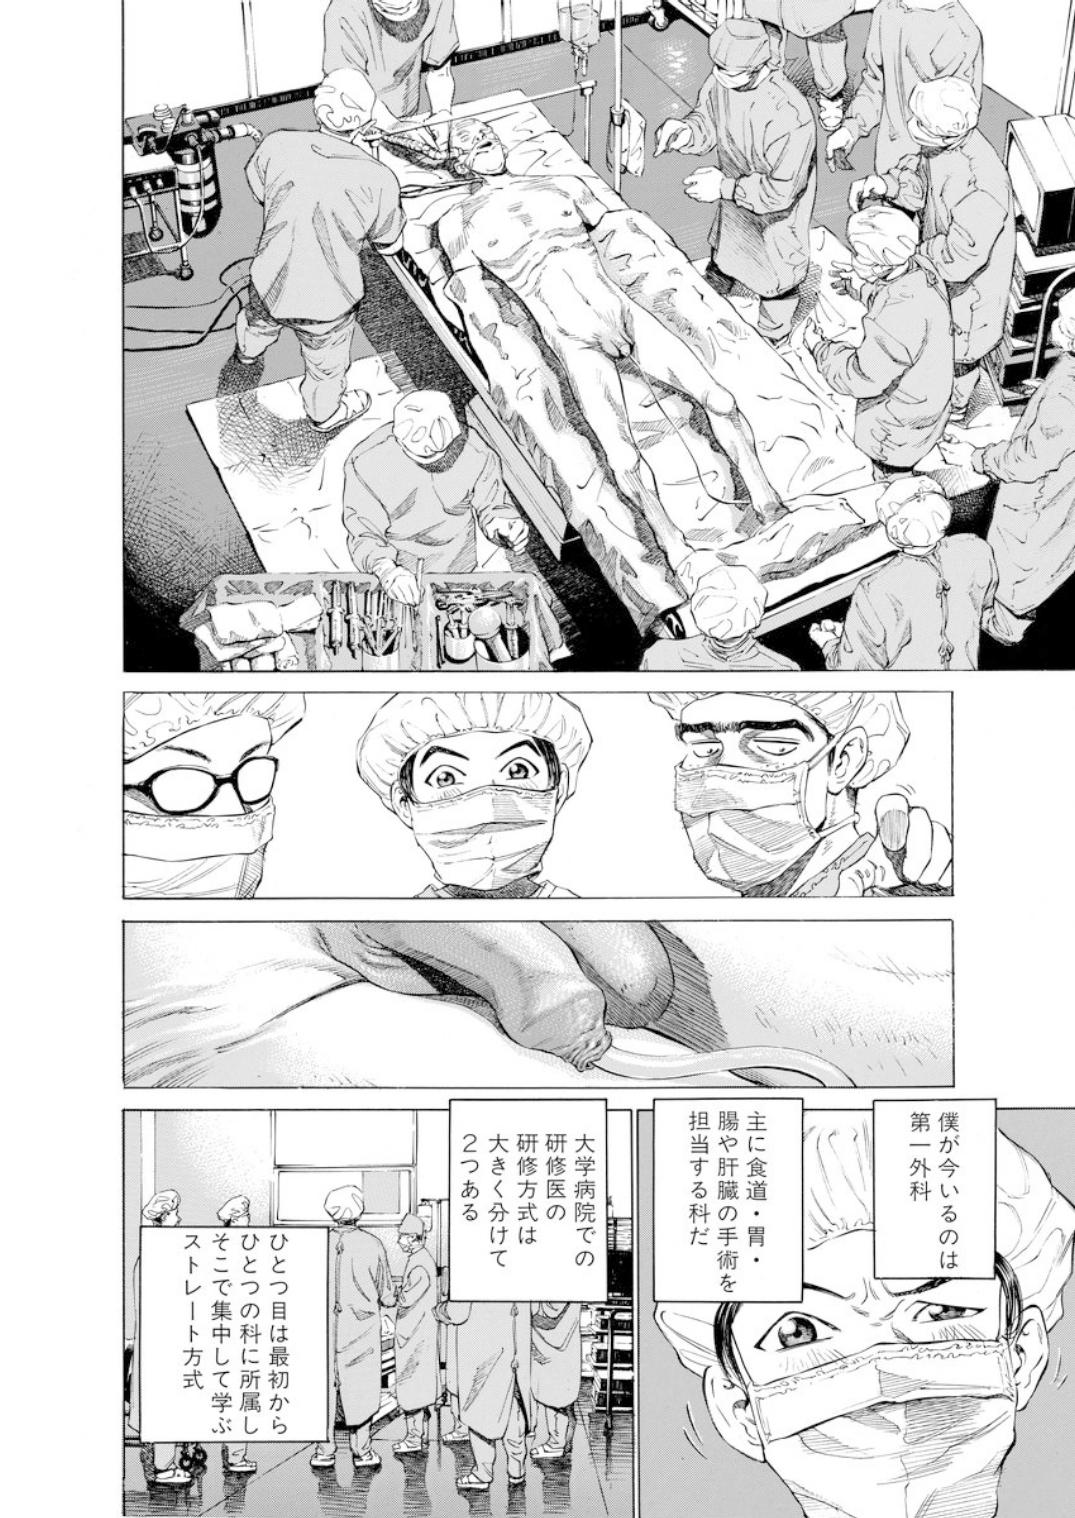 001bj_page-0068.jpg